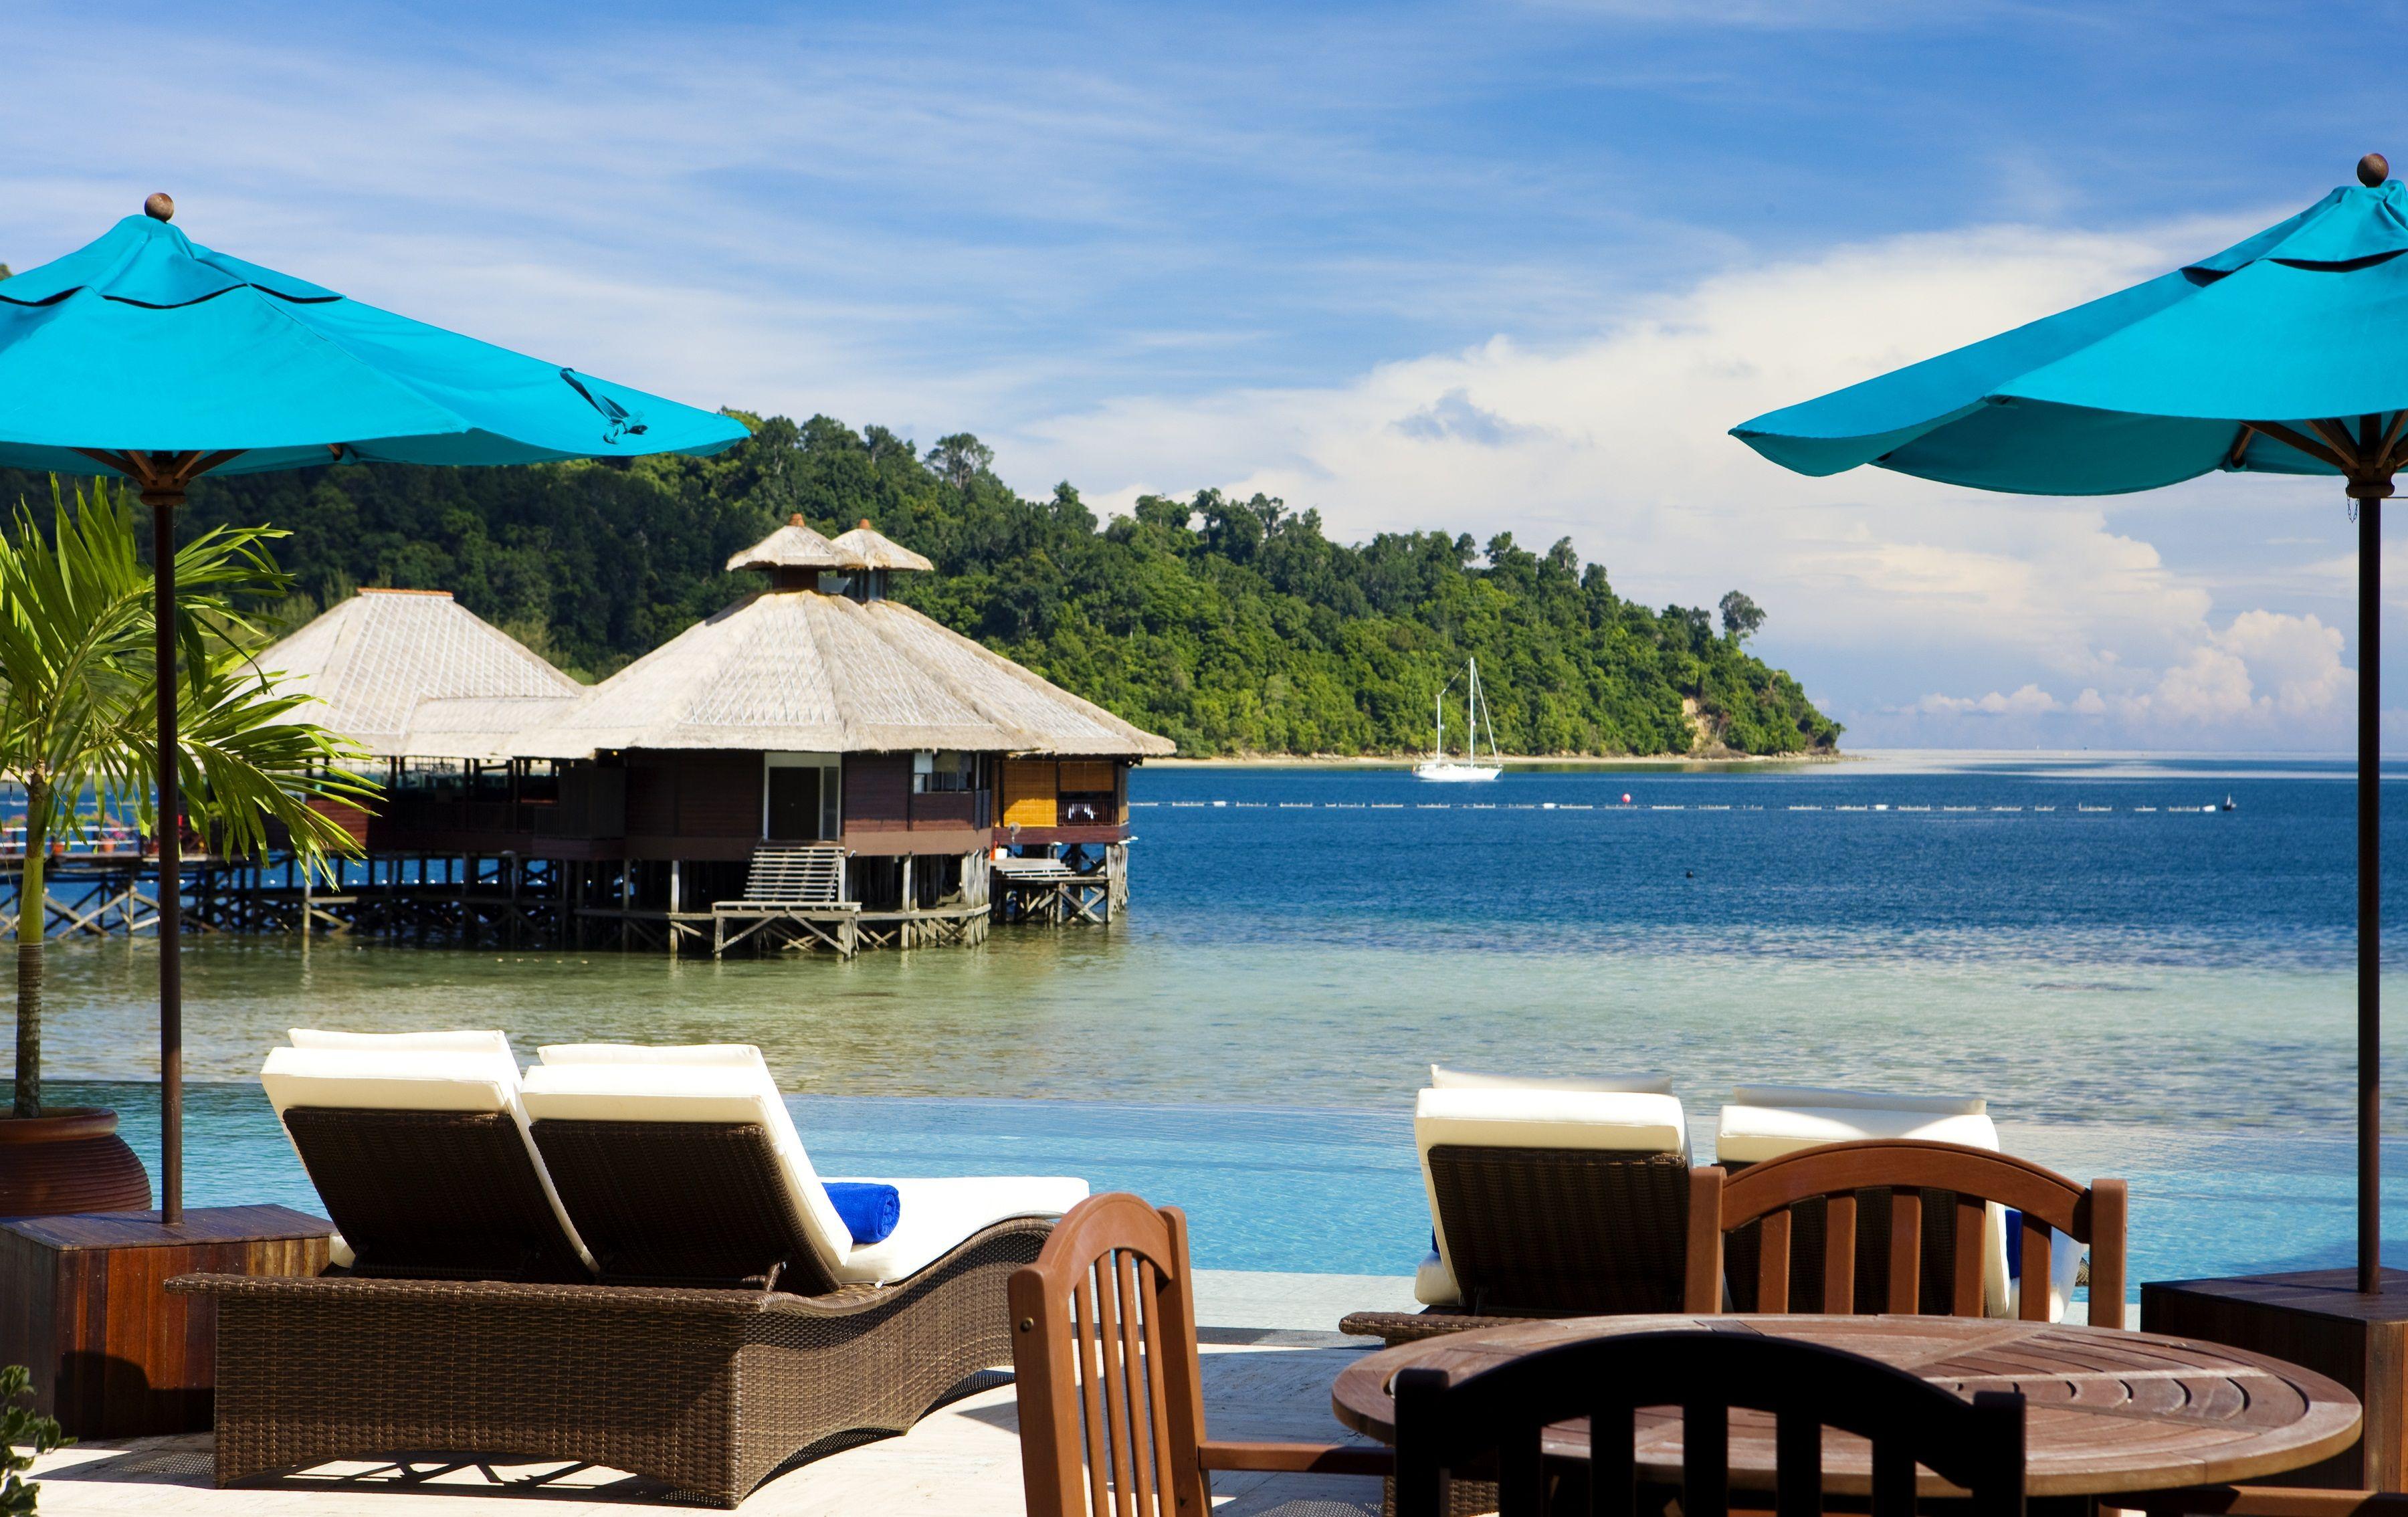 Relax Poolside At Gaya Island Resort, Sabah, Malaysia So Beautiful